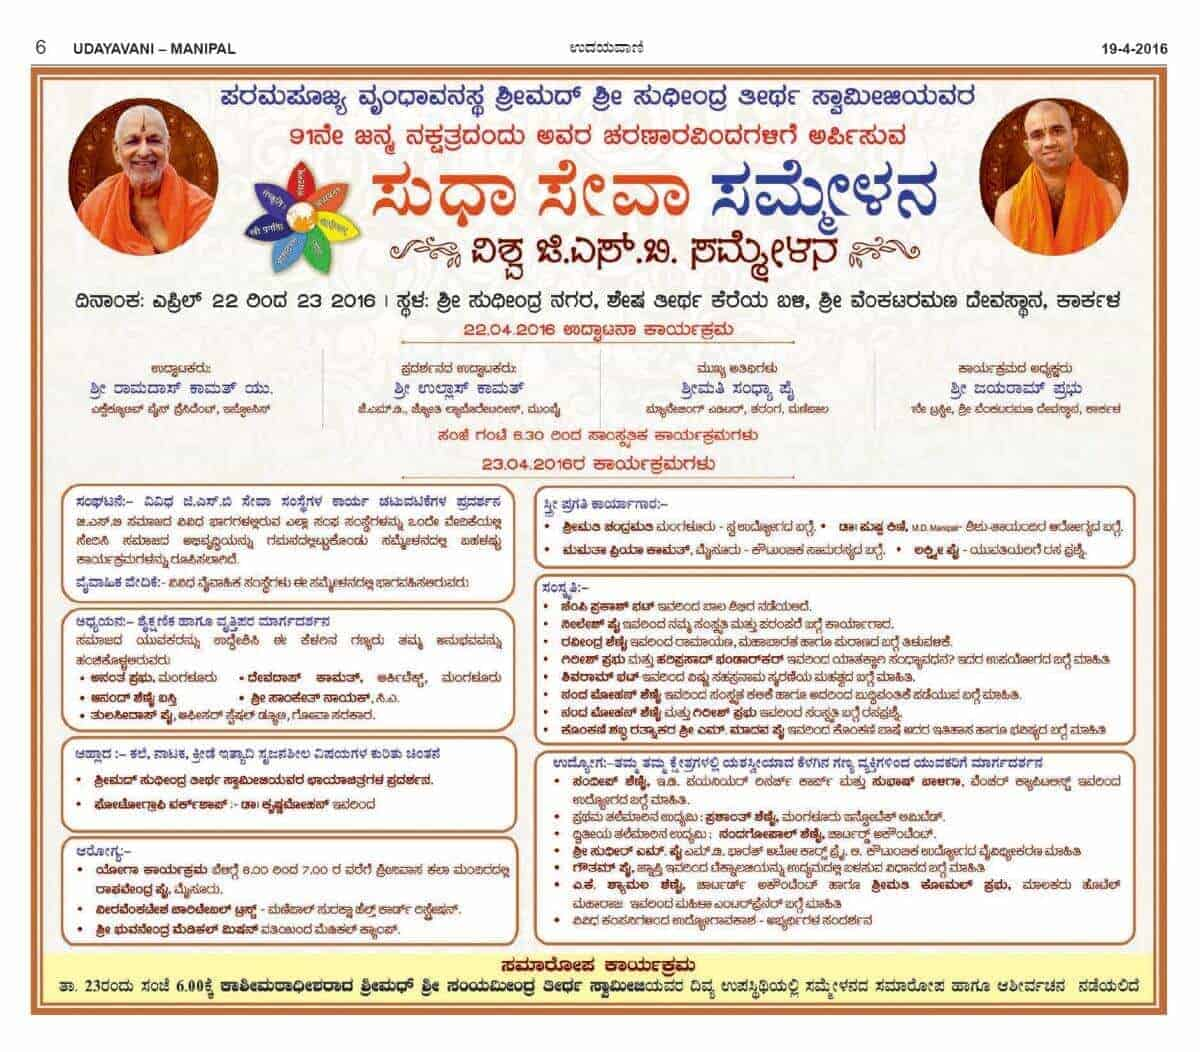 Sudha Seva Sammelan on April 22-23, 2016